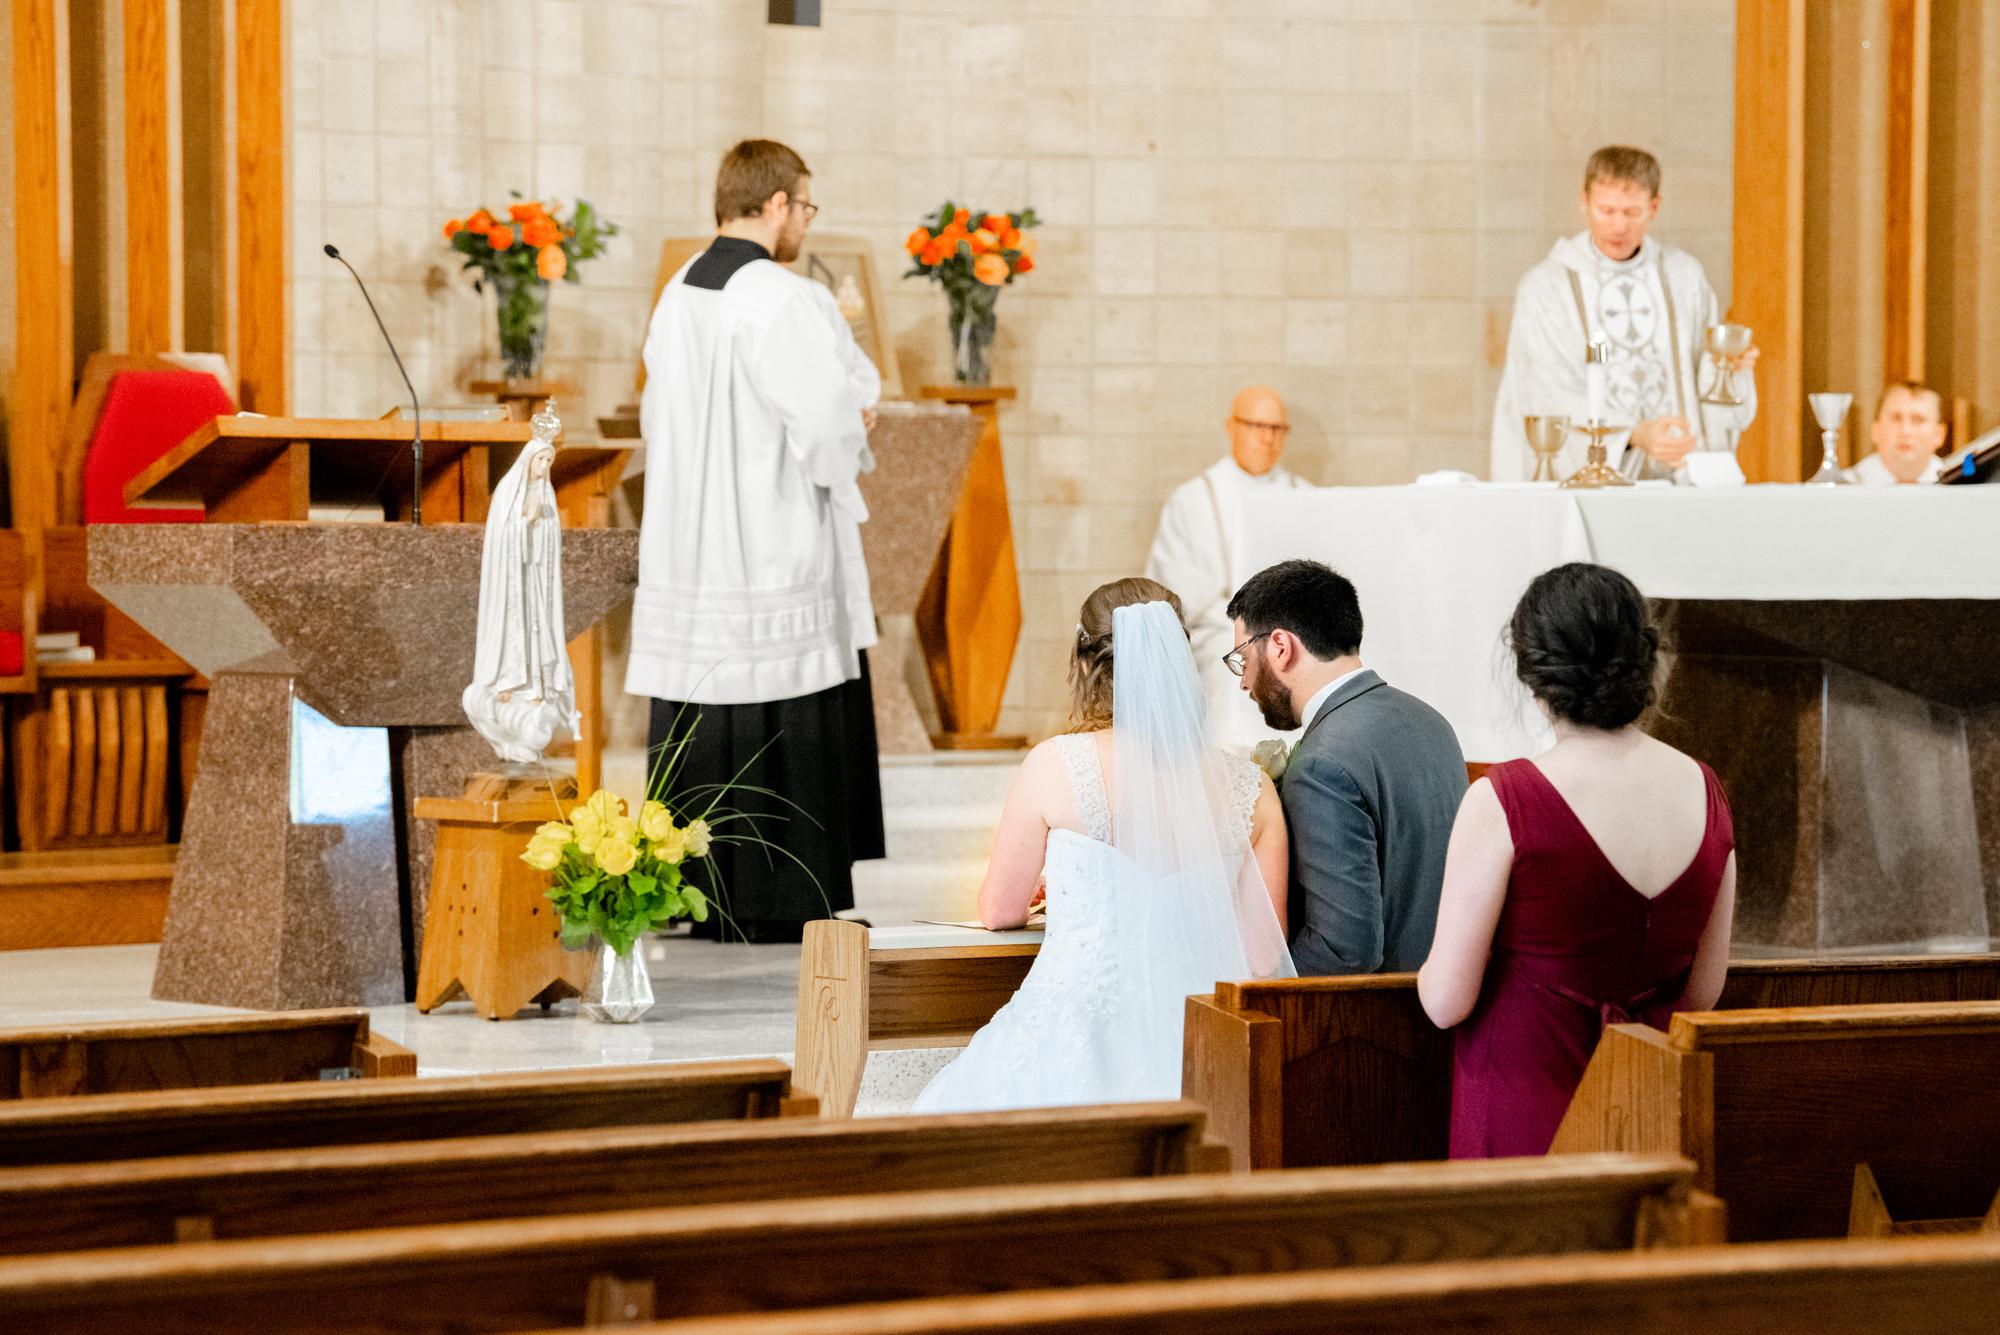 DSC 8250 - Emma and Chris | Fargo Wedding